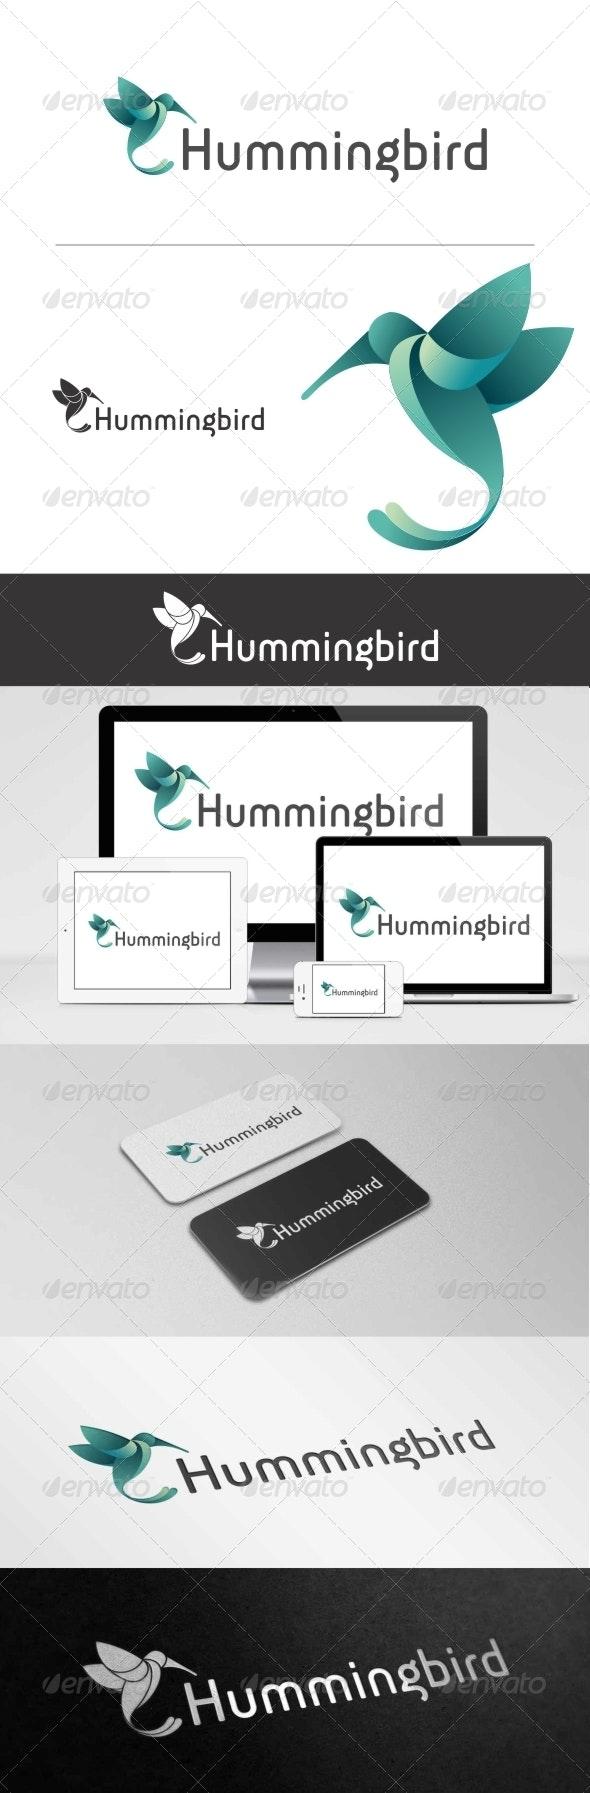 Flying Hummingbird Logo - 3d Abstract